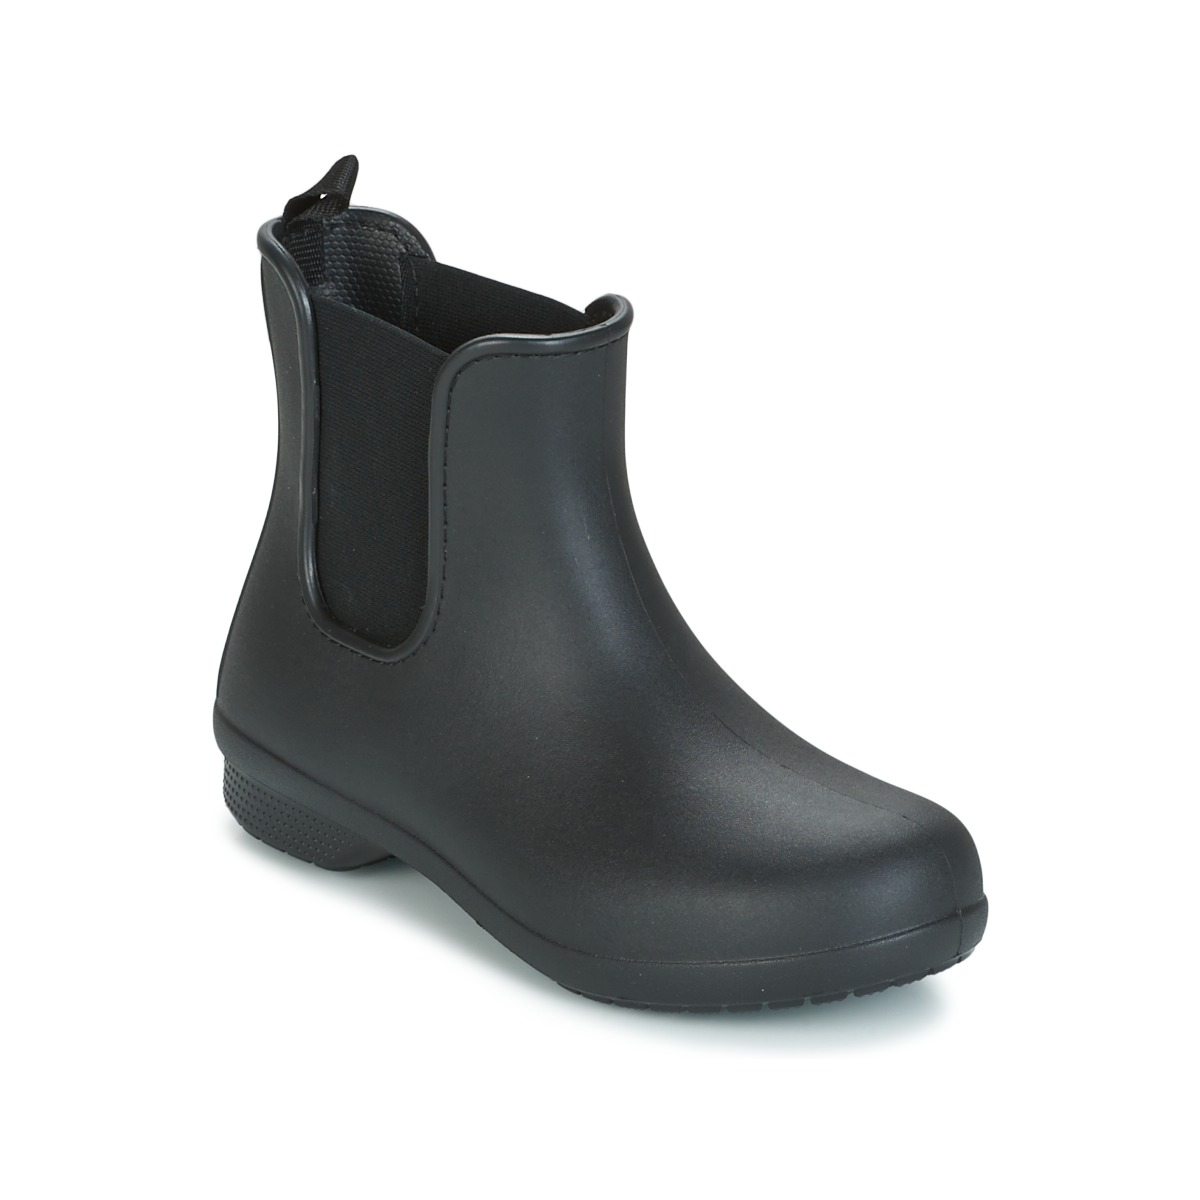 Crocs CROCS FREESAIL CHELSEA Schwarz - Kostenloser Versand bei Spartoode ! - Schuhe Boots Damen 40,00 €